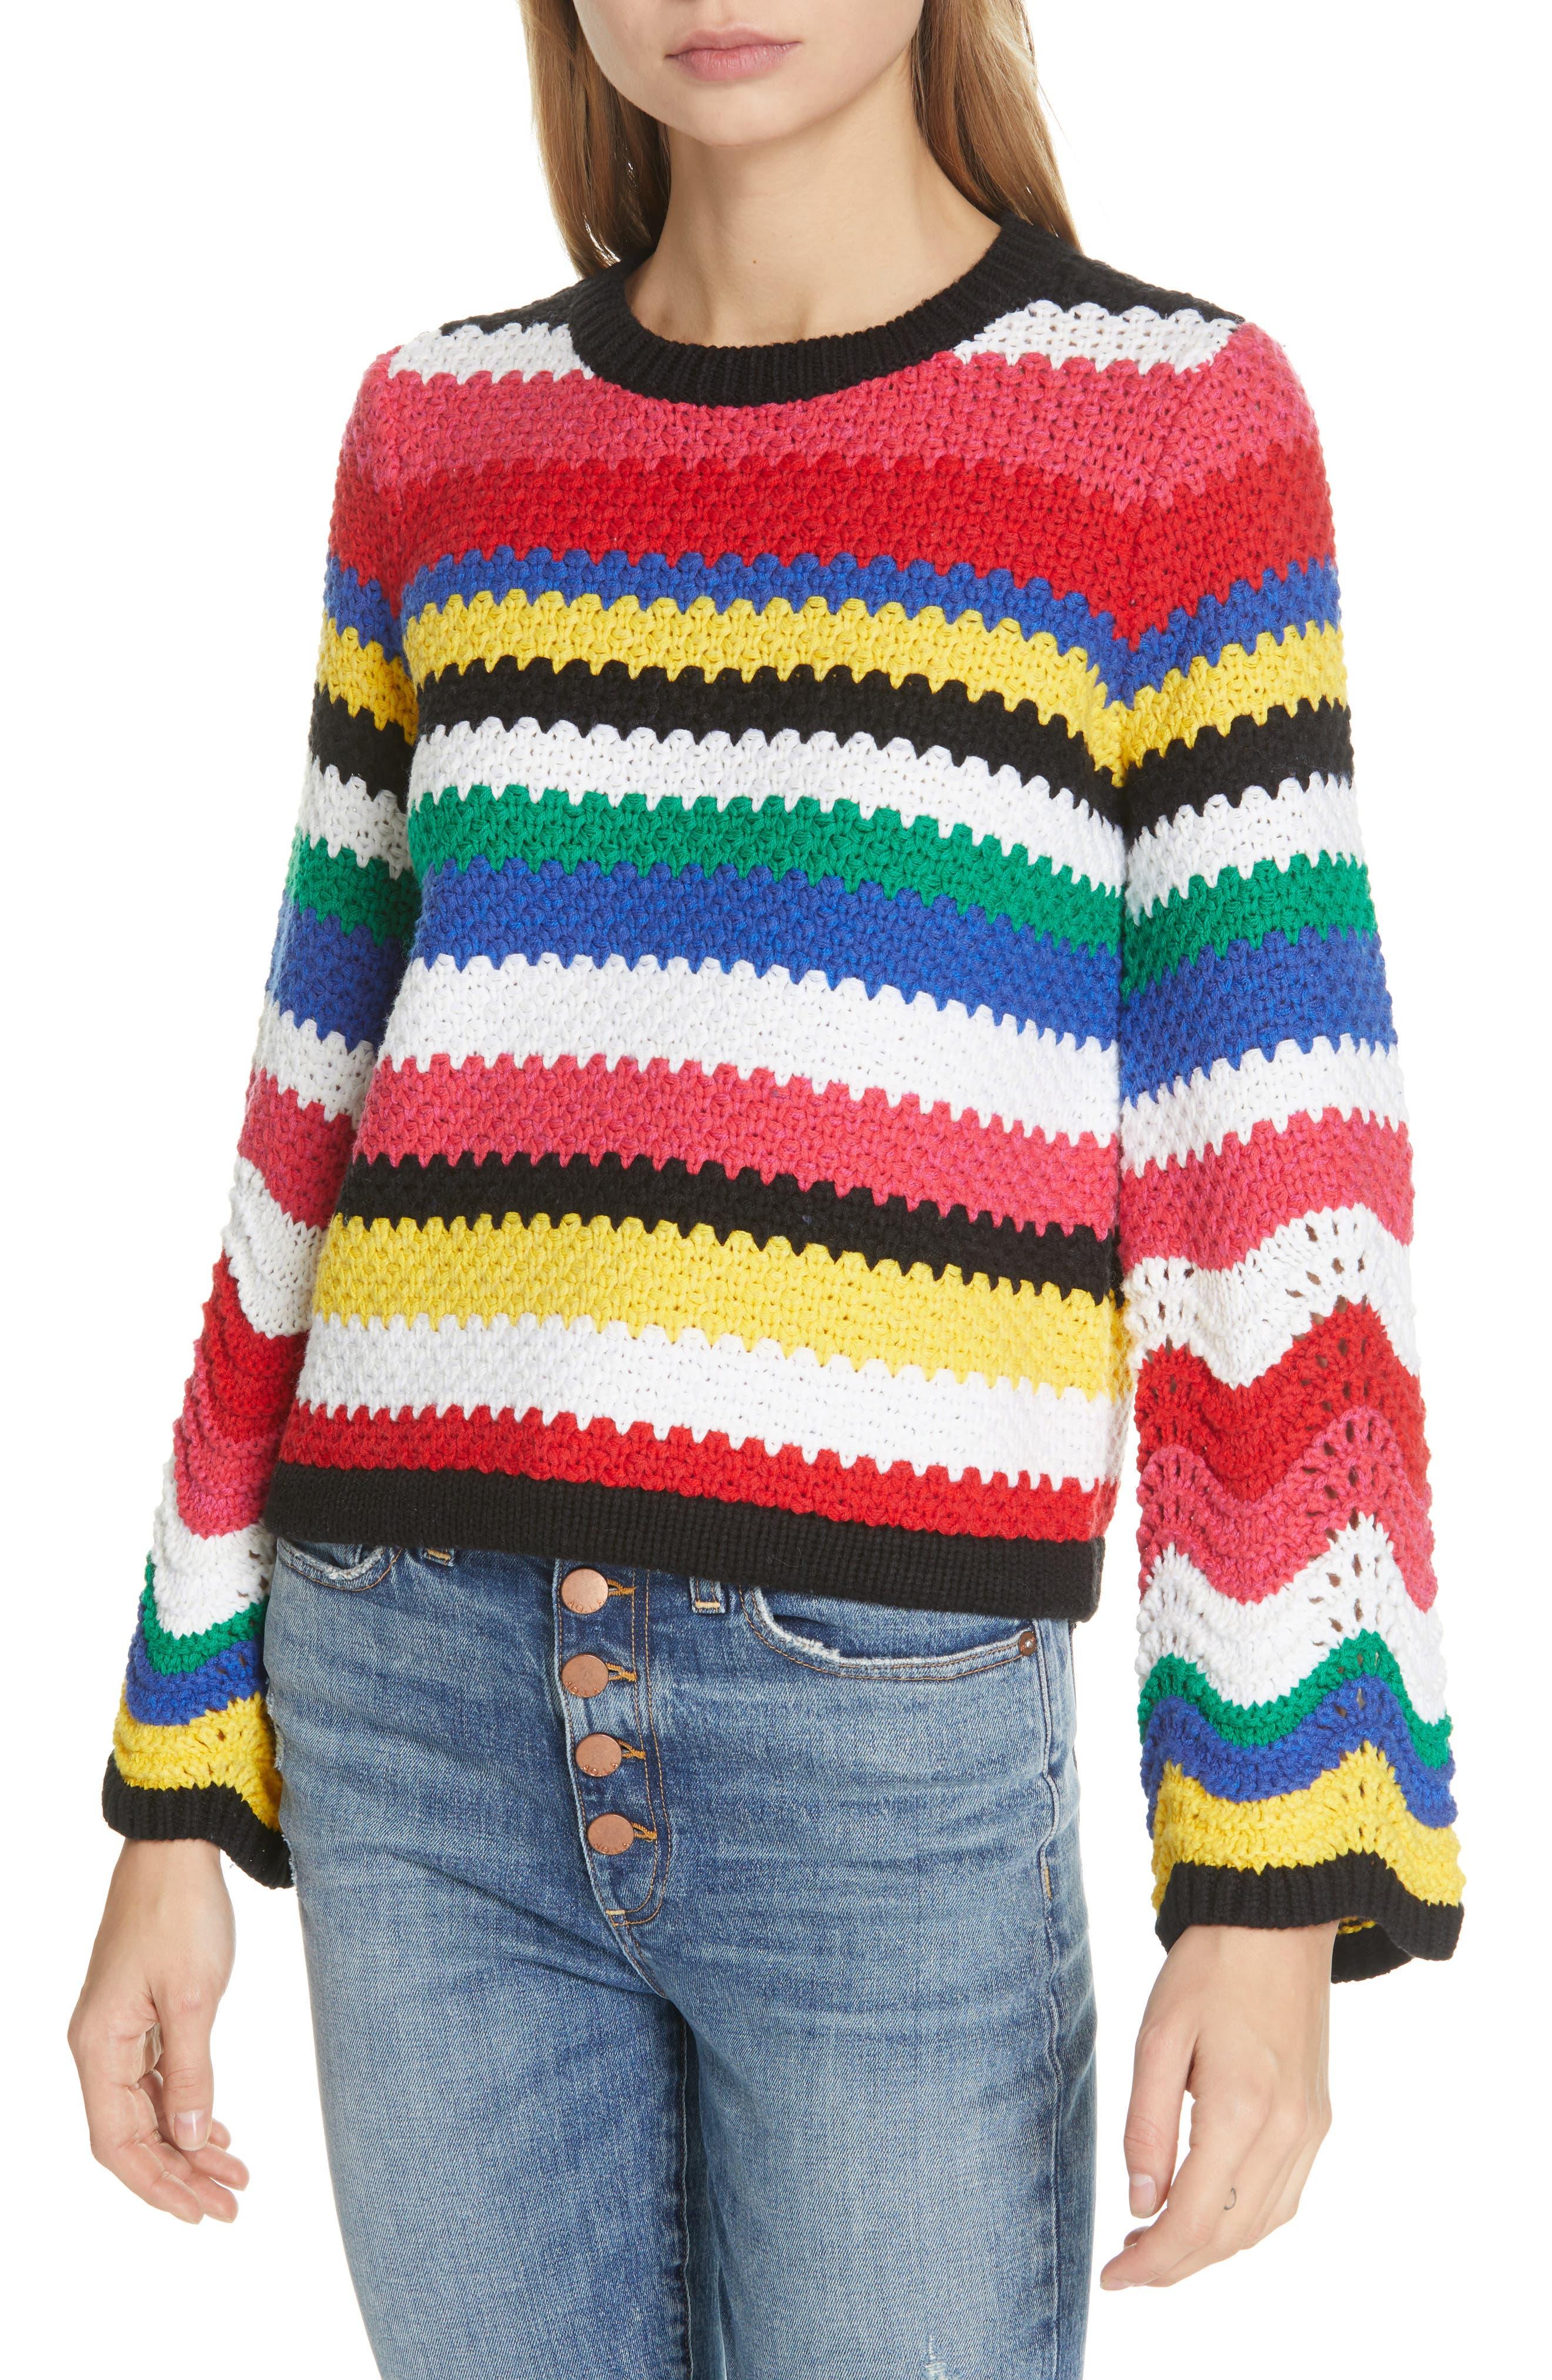 ALICE + OLIVIA, Alivia Stripe Bell Sleeve Cotton Blend Sweater, Main thumbnail 1, color, MULTI